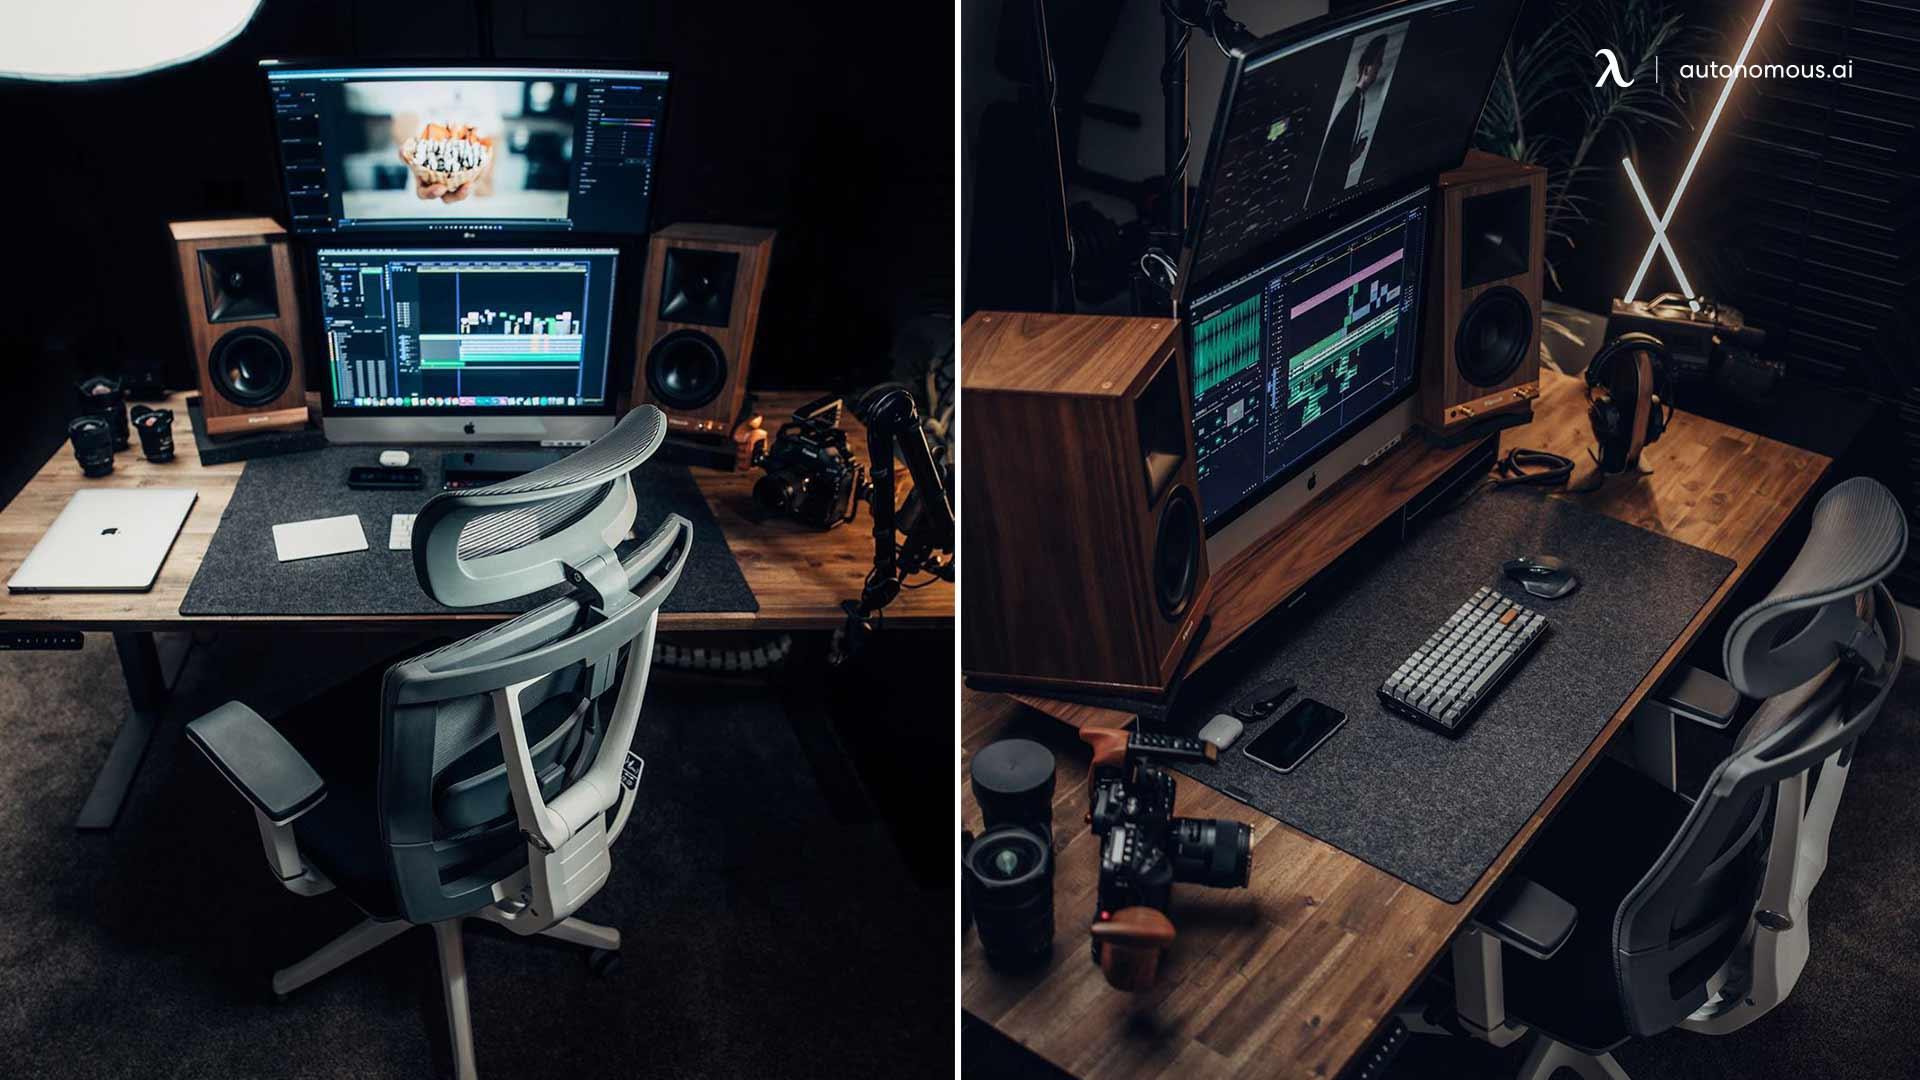 Two screens desk setup